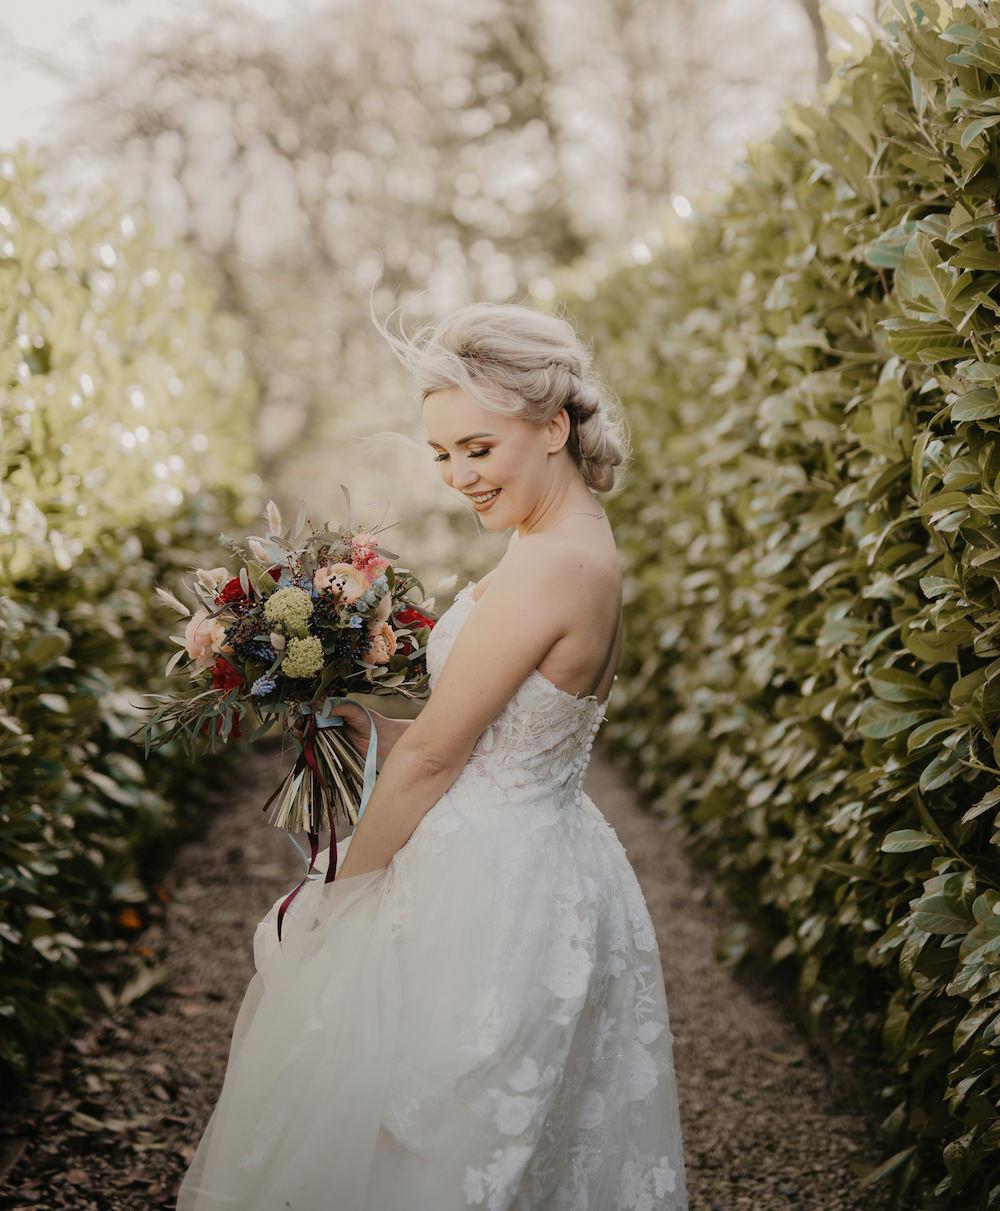 Dress Gown Bride Bridal Strapless France Elopement Ideas Pierra G Photography